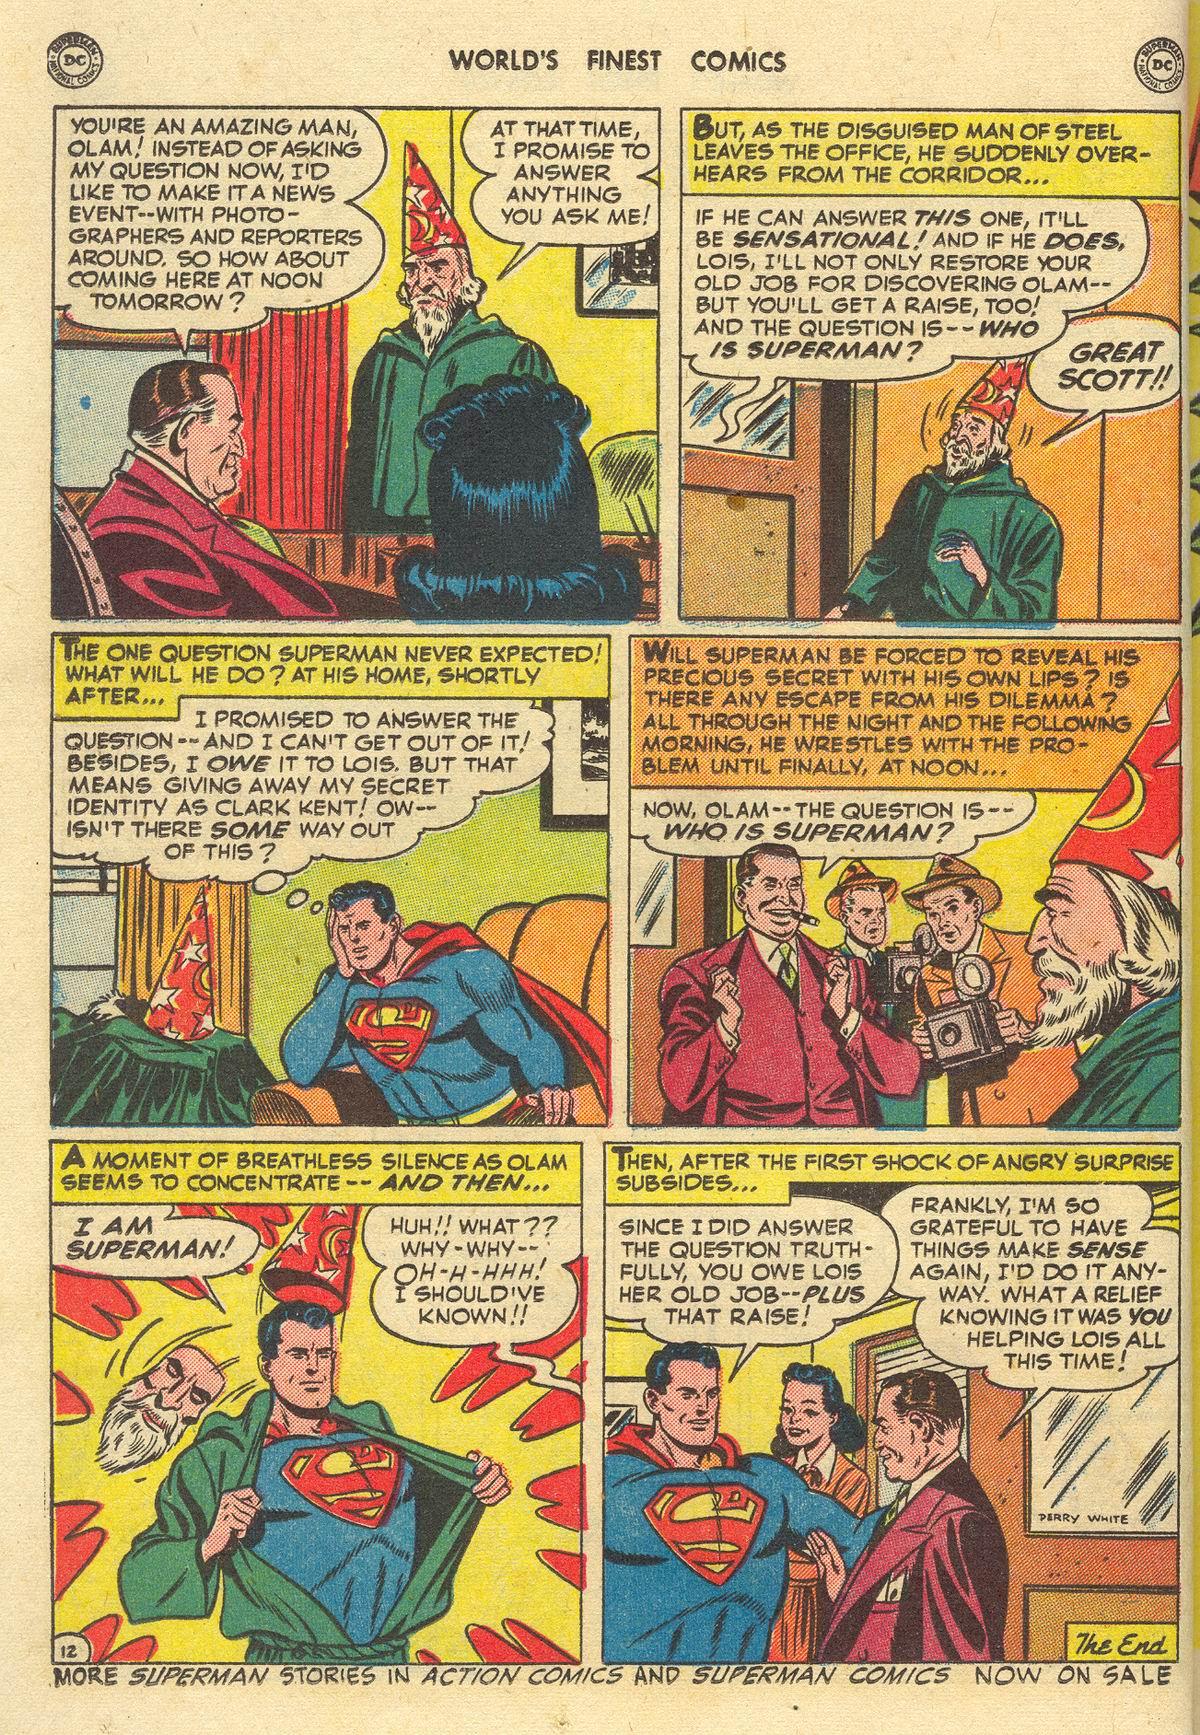 Read online World's Finest Comics comic -  Issue #51 - 14